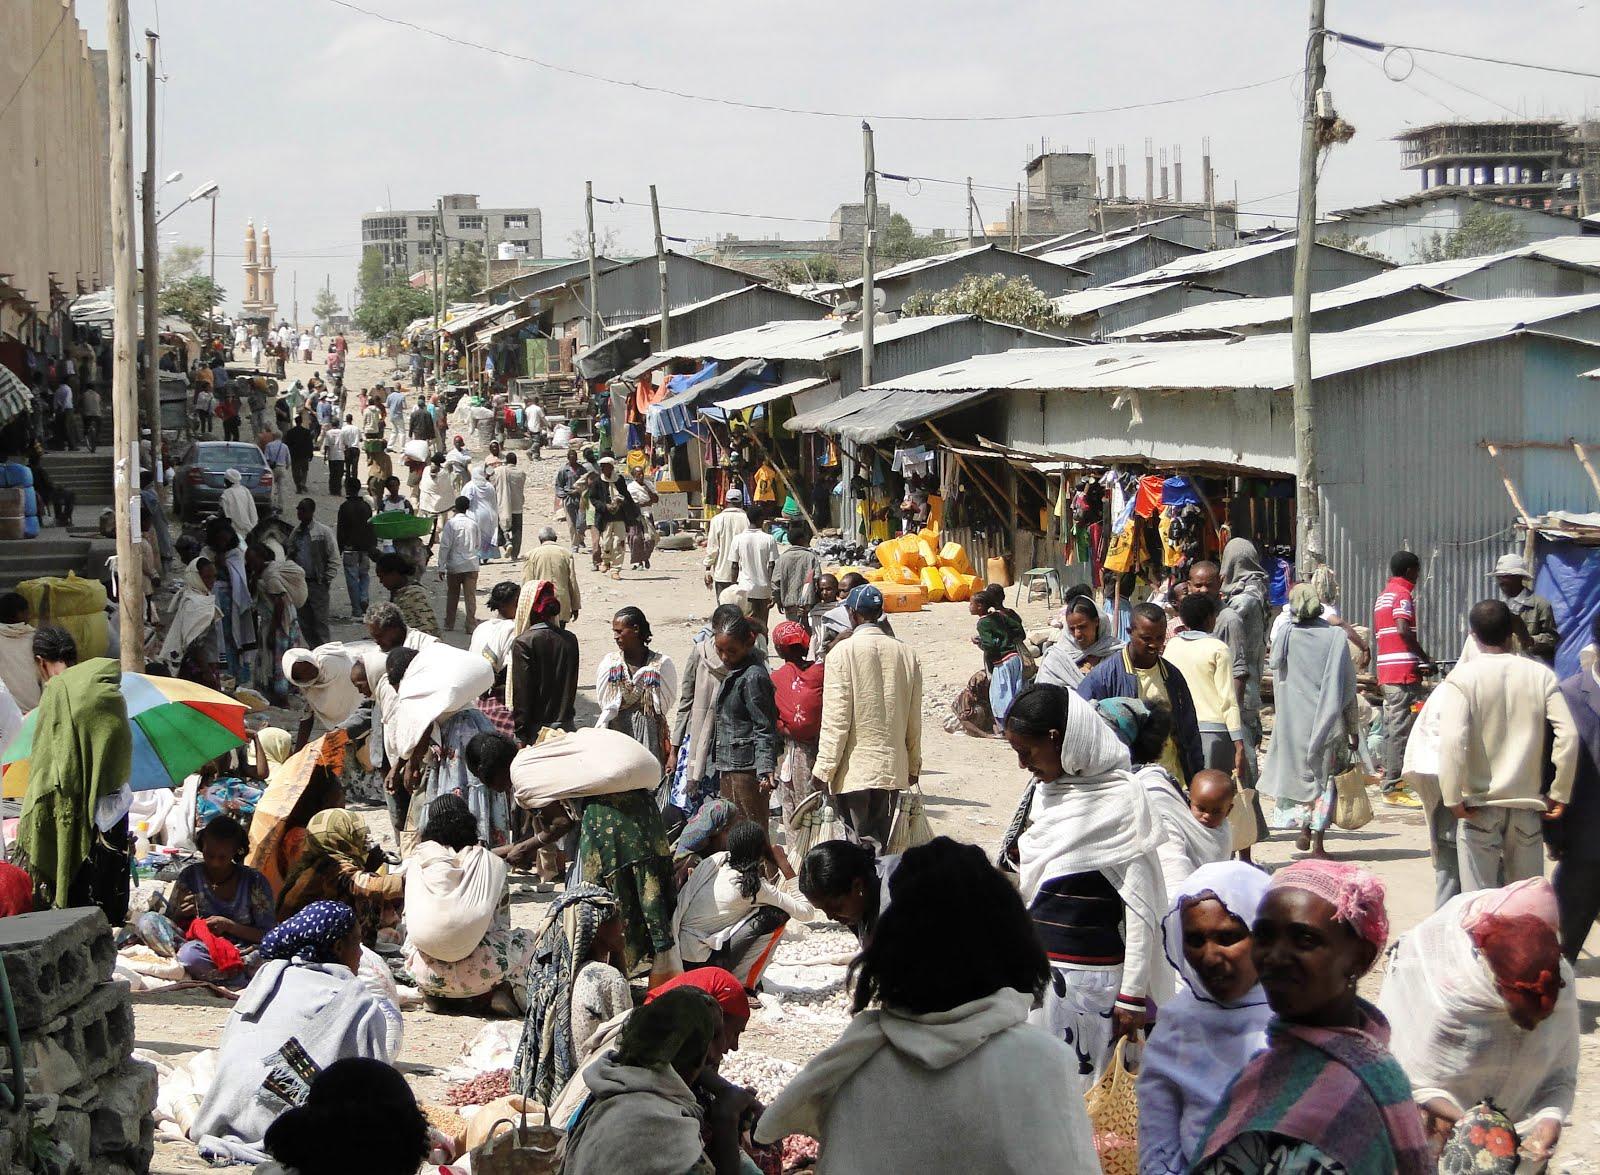 <Ethiopia&rsquo;s Economy System Transcends to Pro or Anti-Poor Polemics